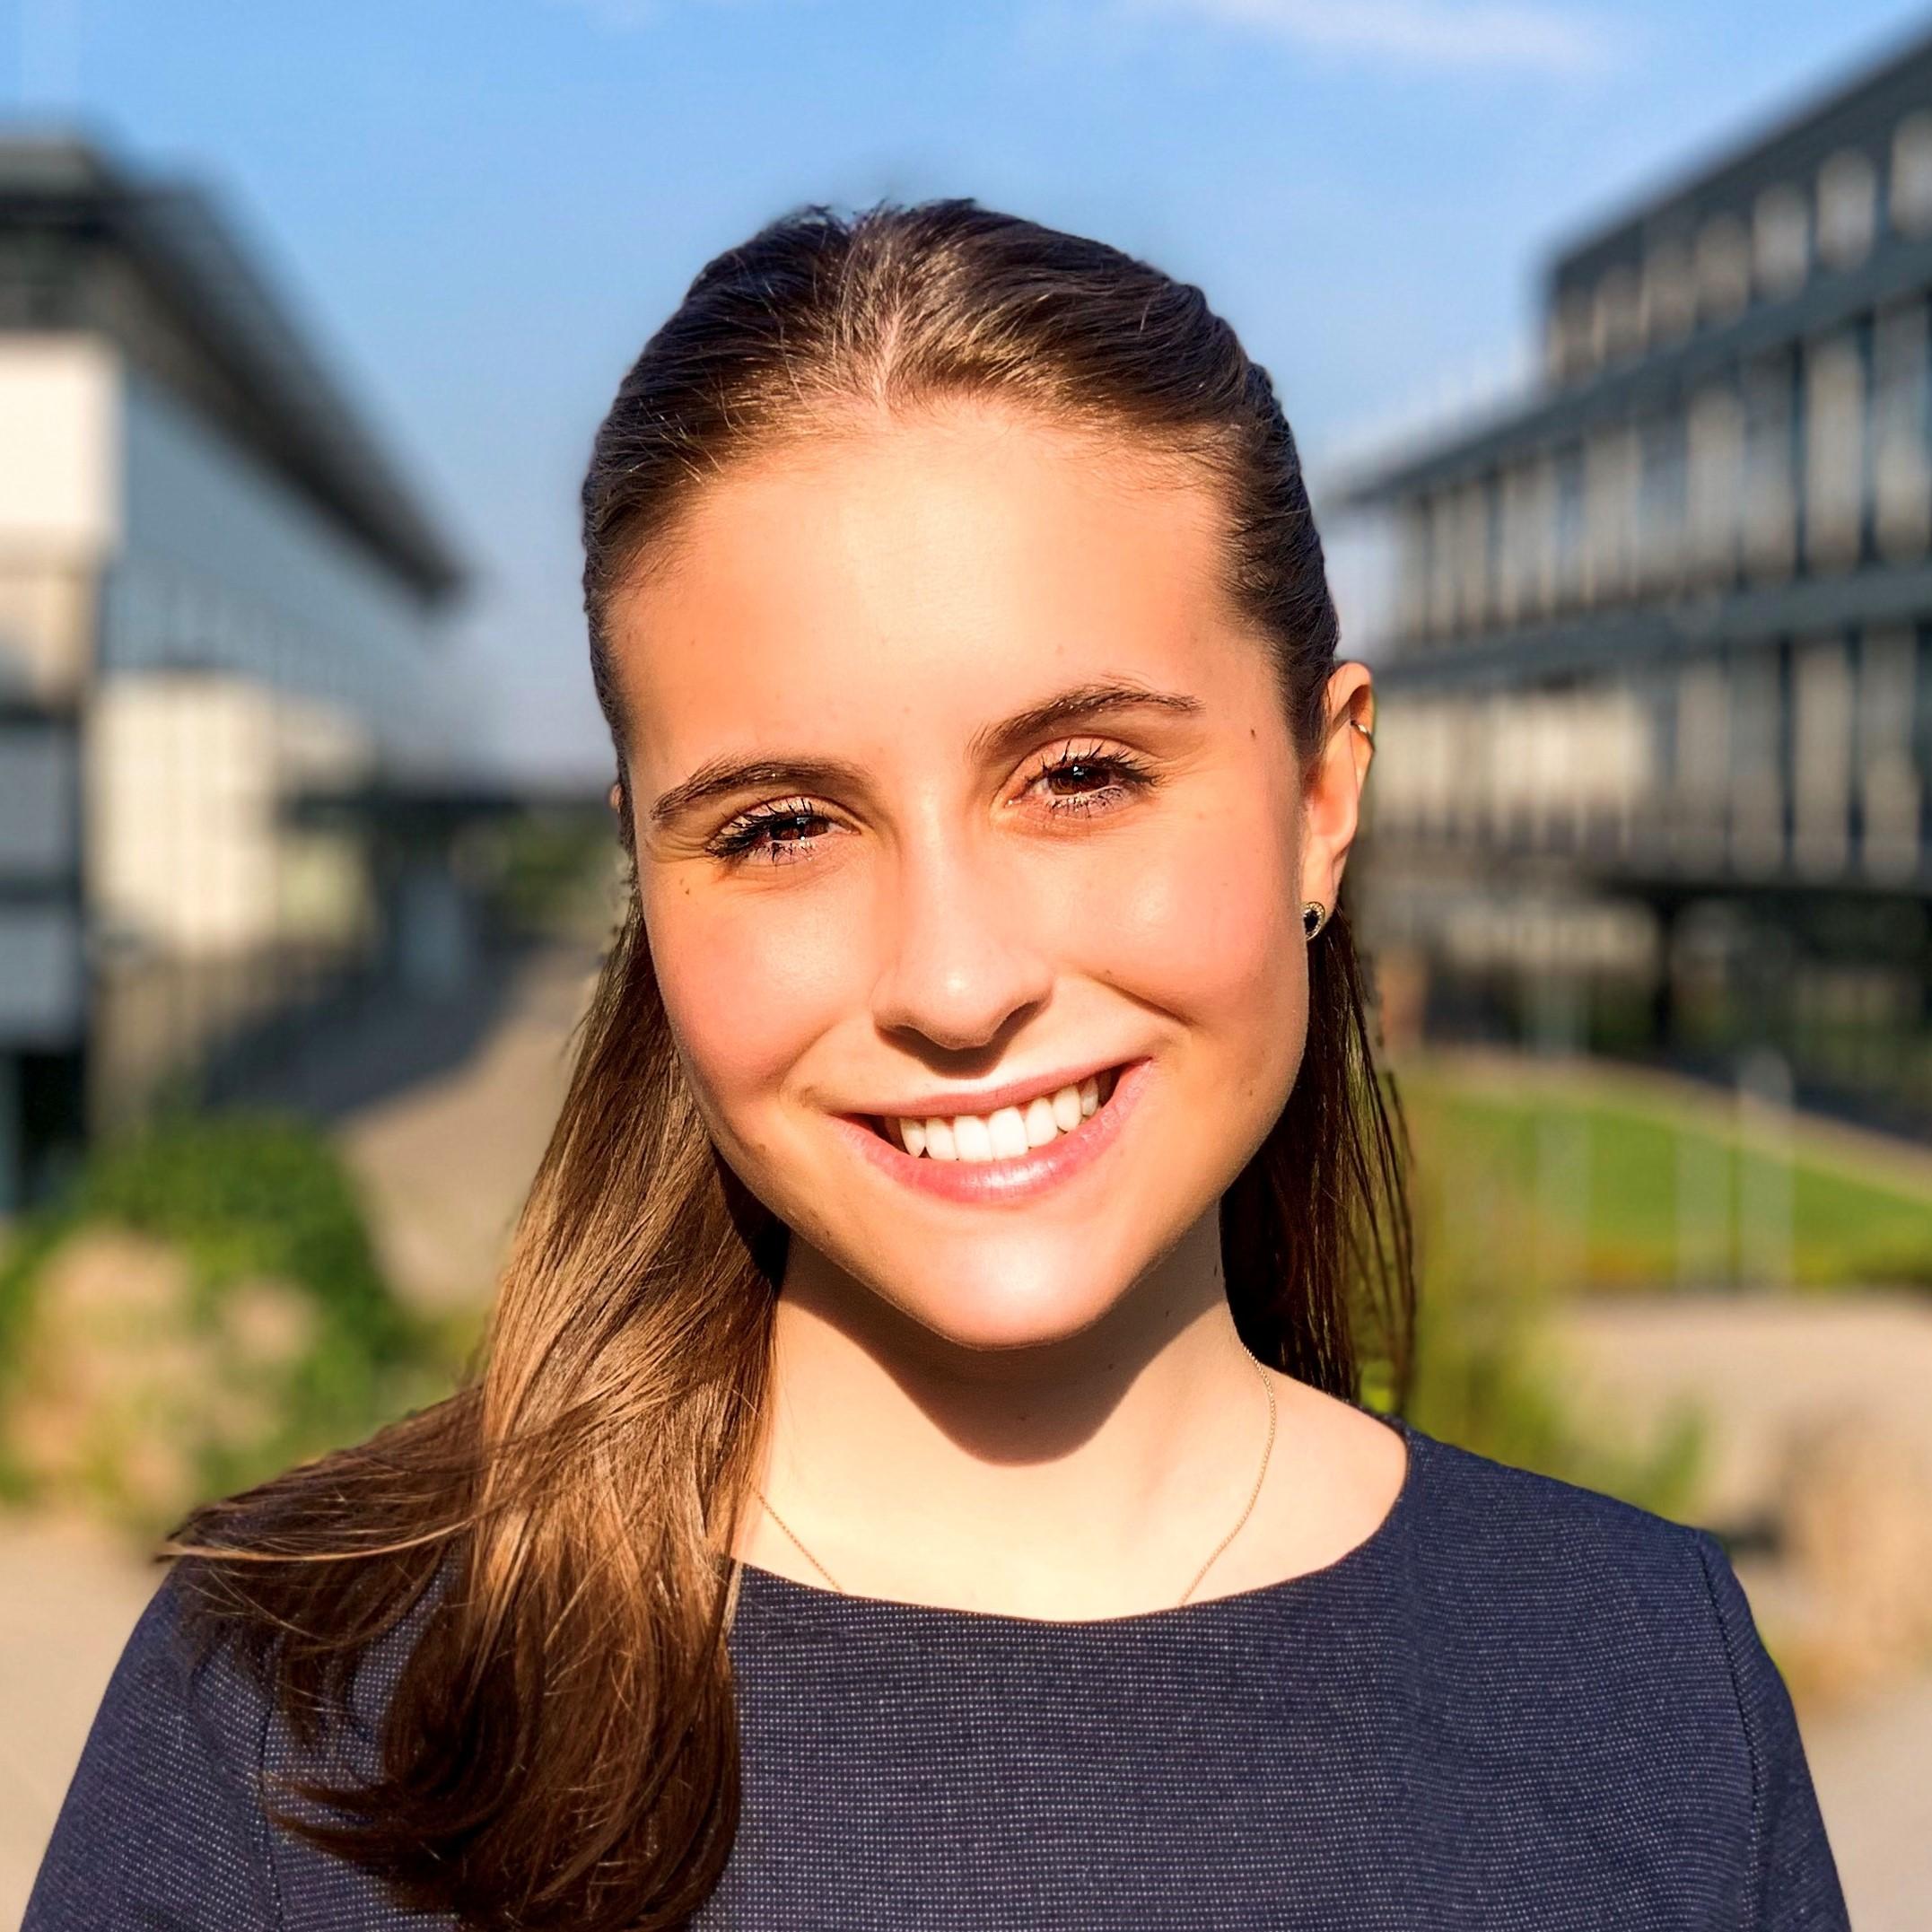 Antonia Baumeister